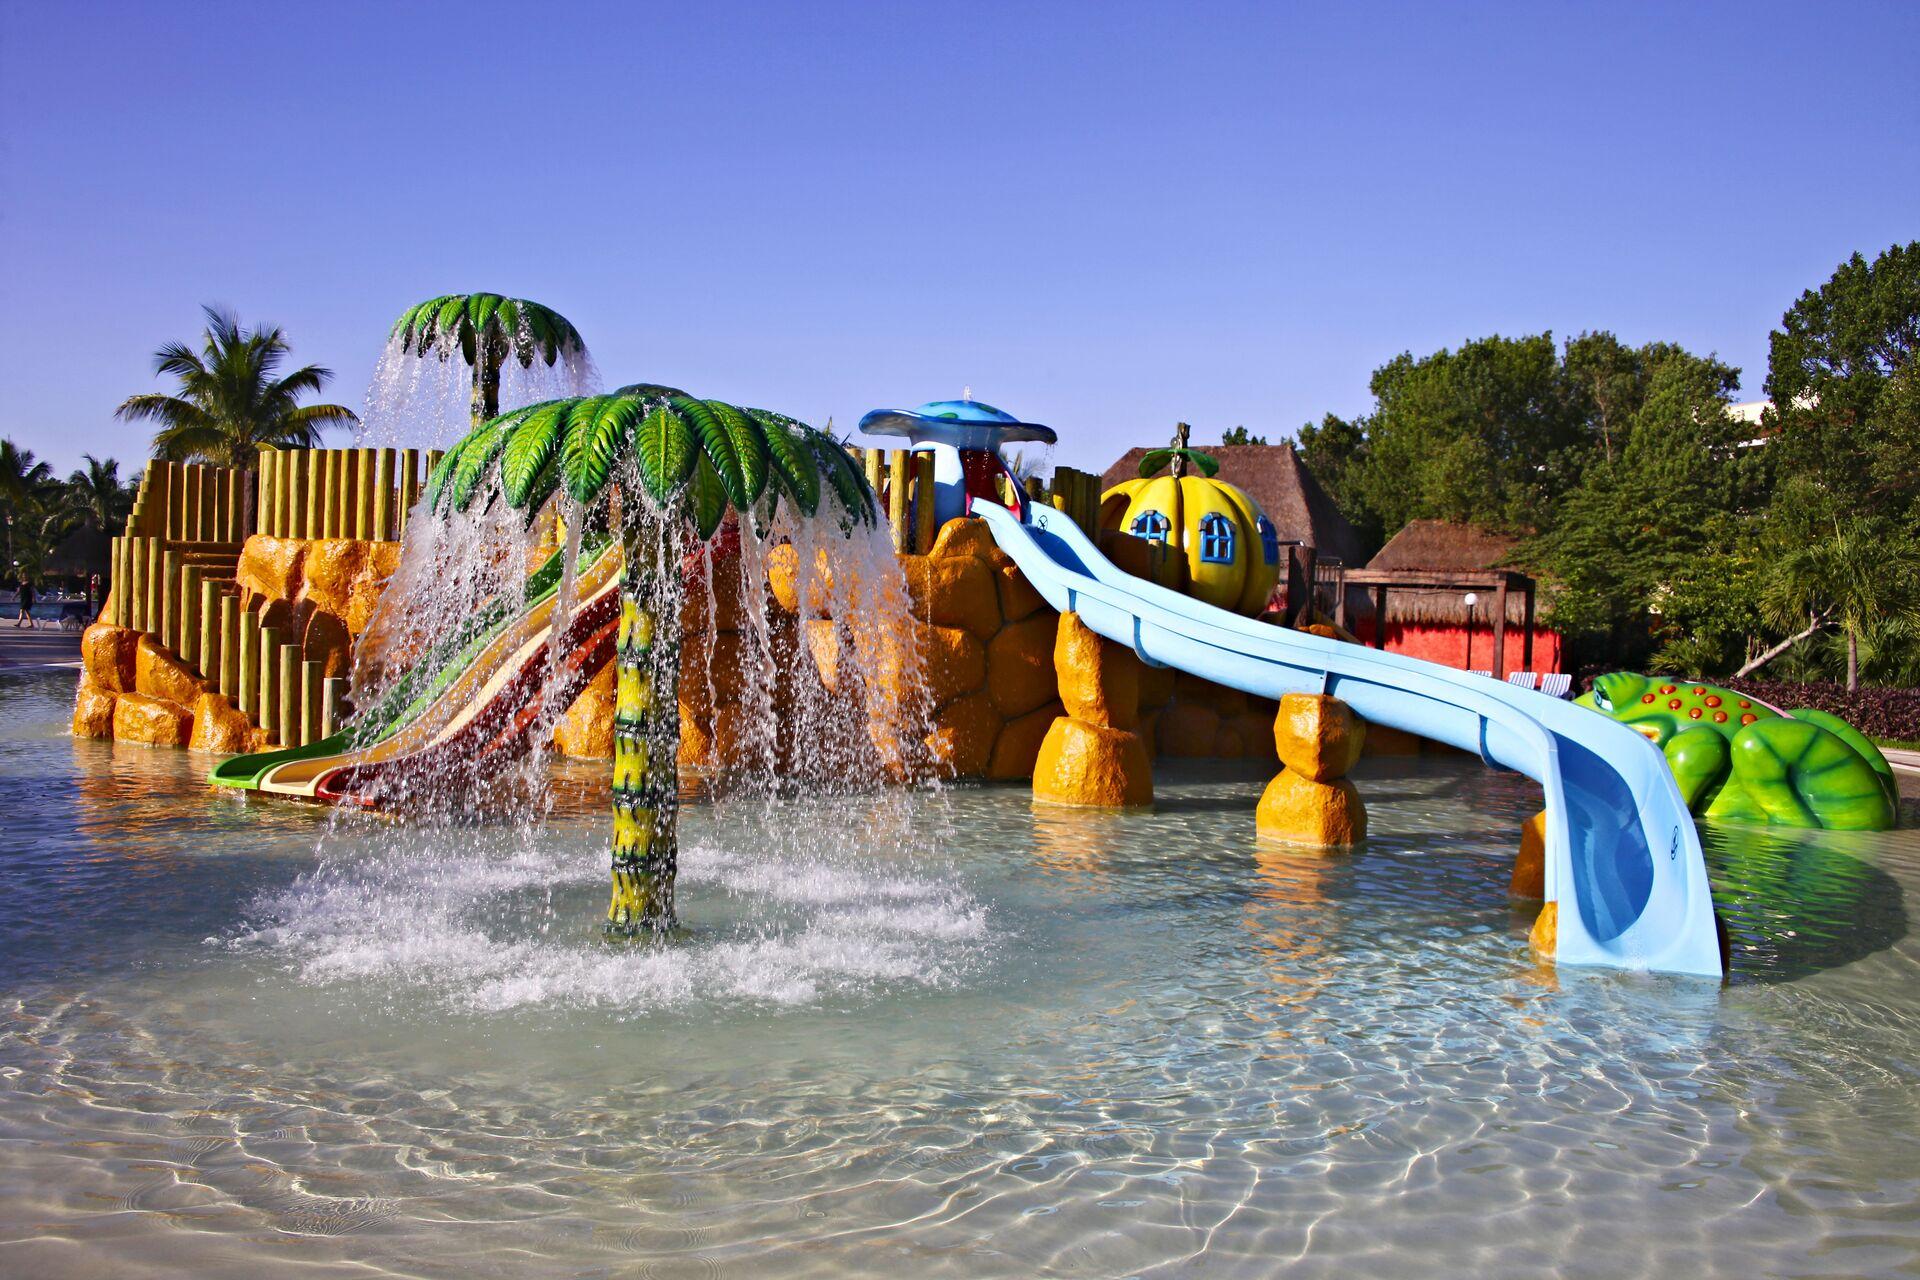 https://cms.satur.sk/data/imgs/tour_image/orig/gbpcob_mex_pool_waterpark_010-2013601.jpg